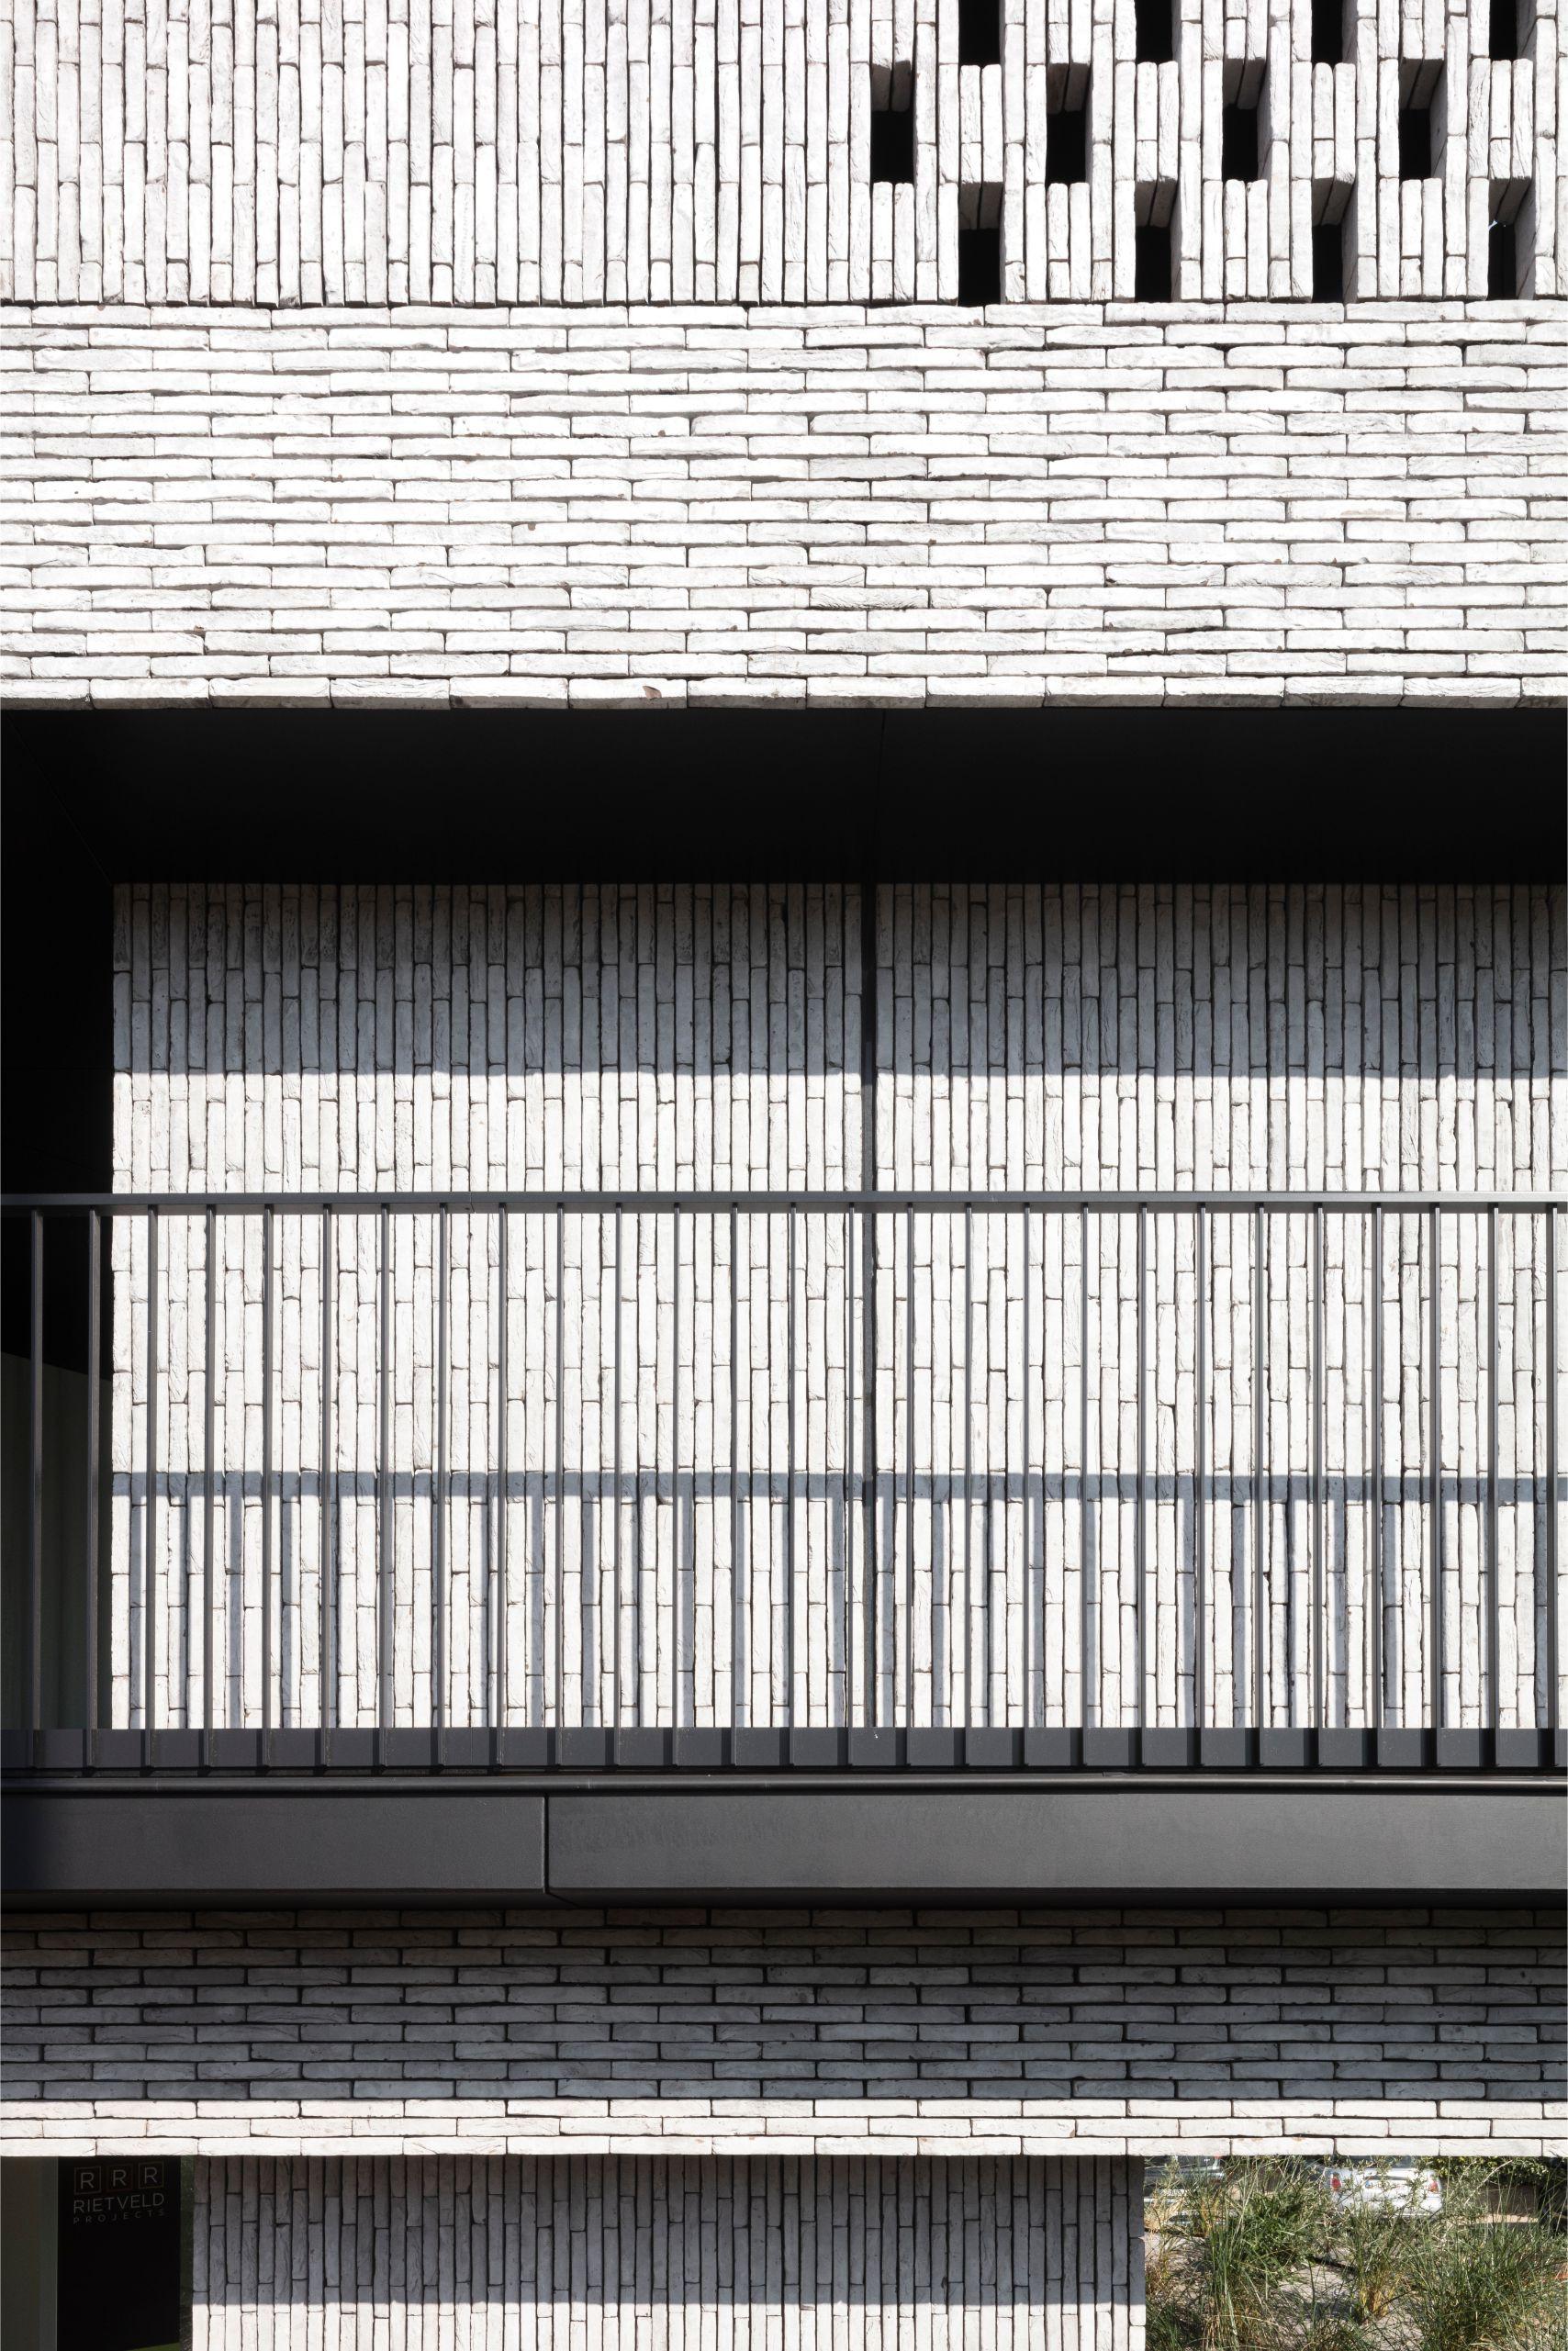 Pierre Paulin - Rietveldprojects - Sint-Idesbald - Tvdv7.jpg